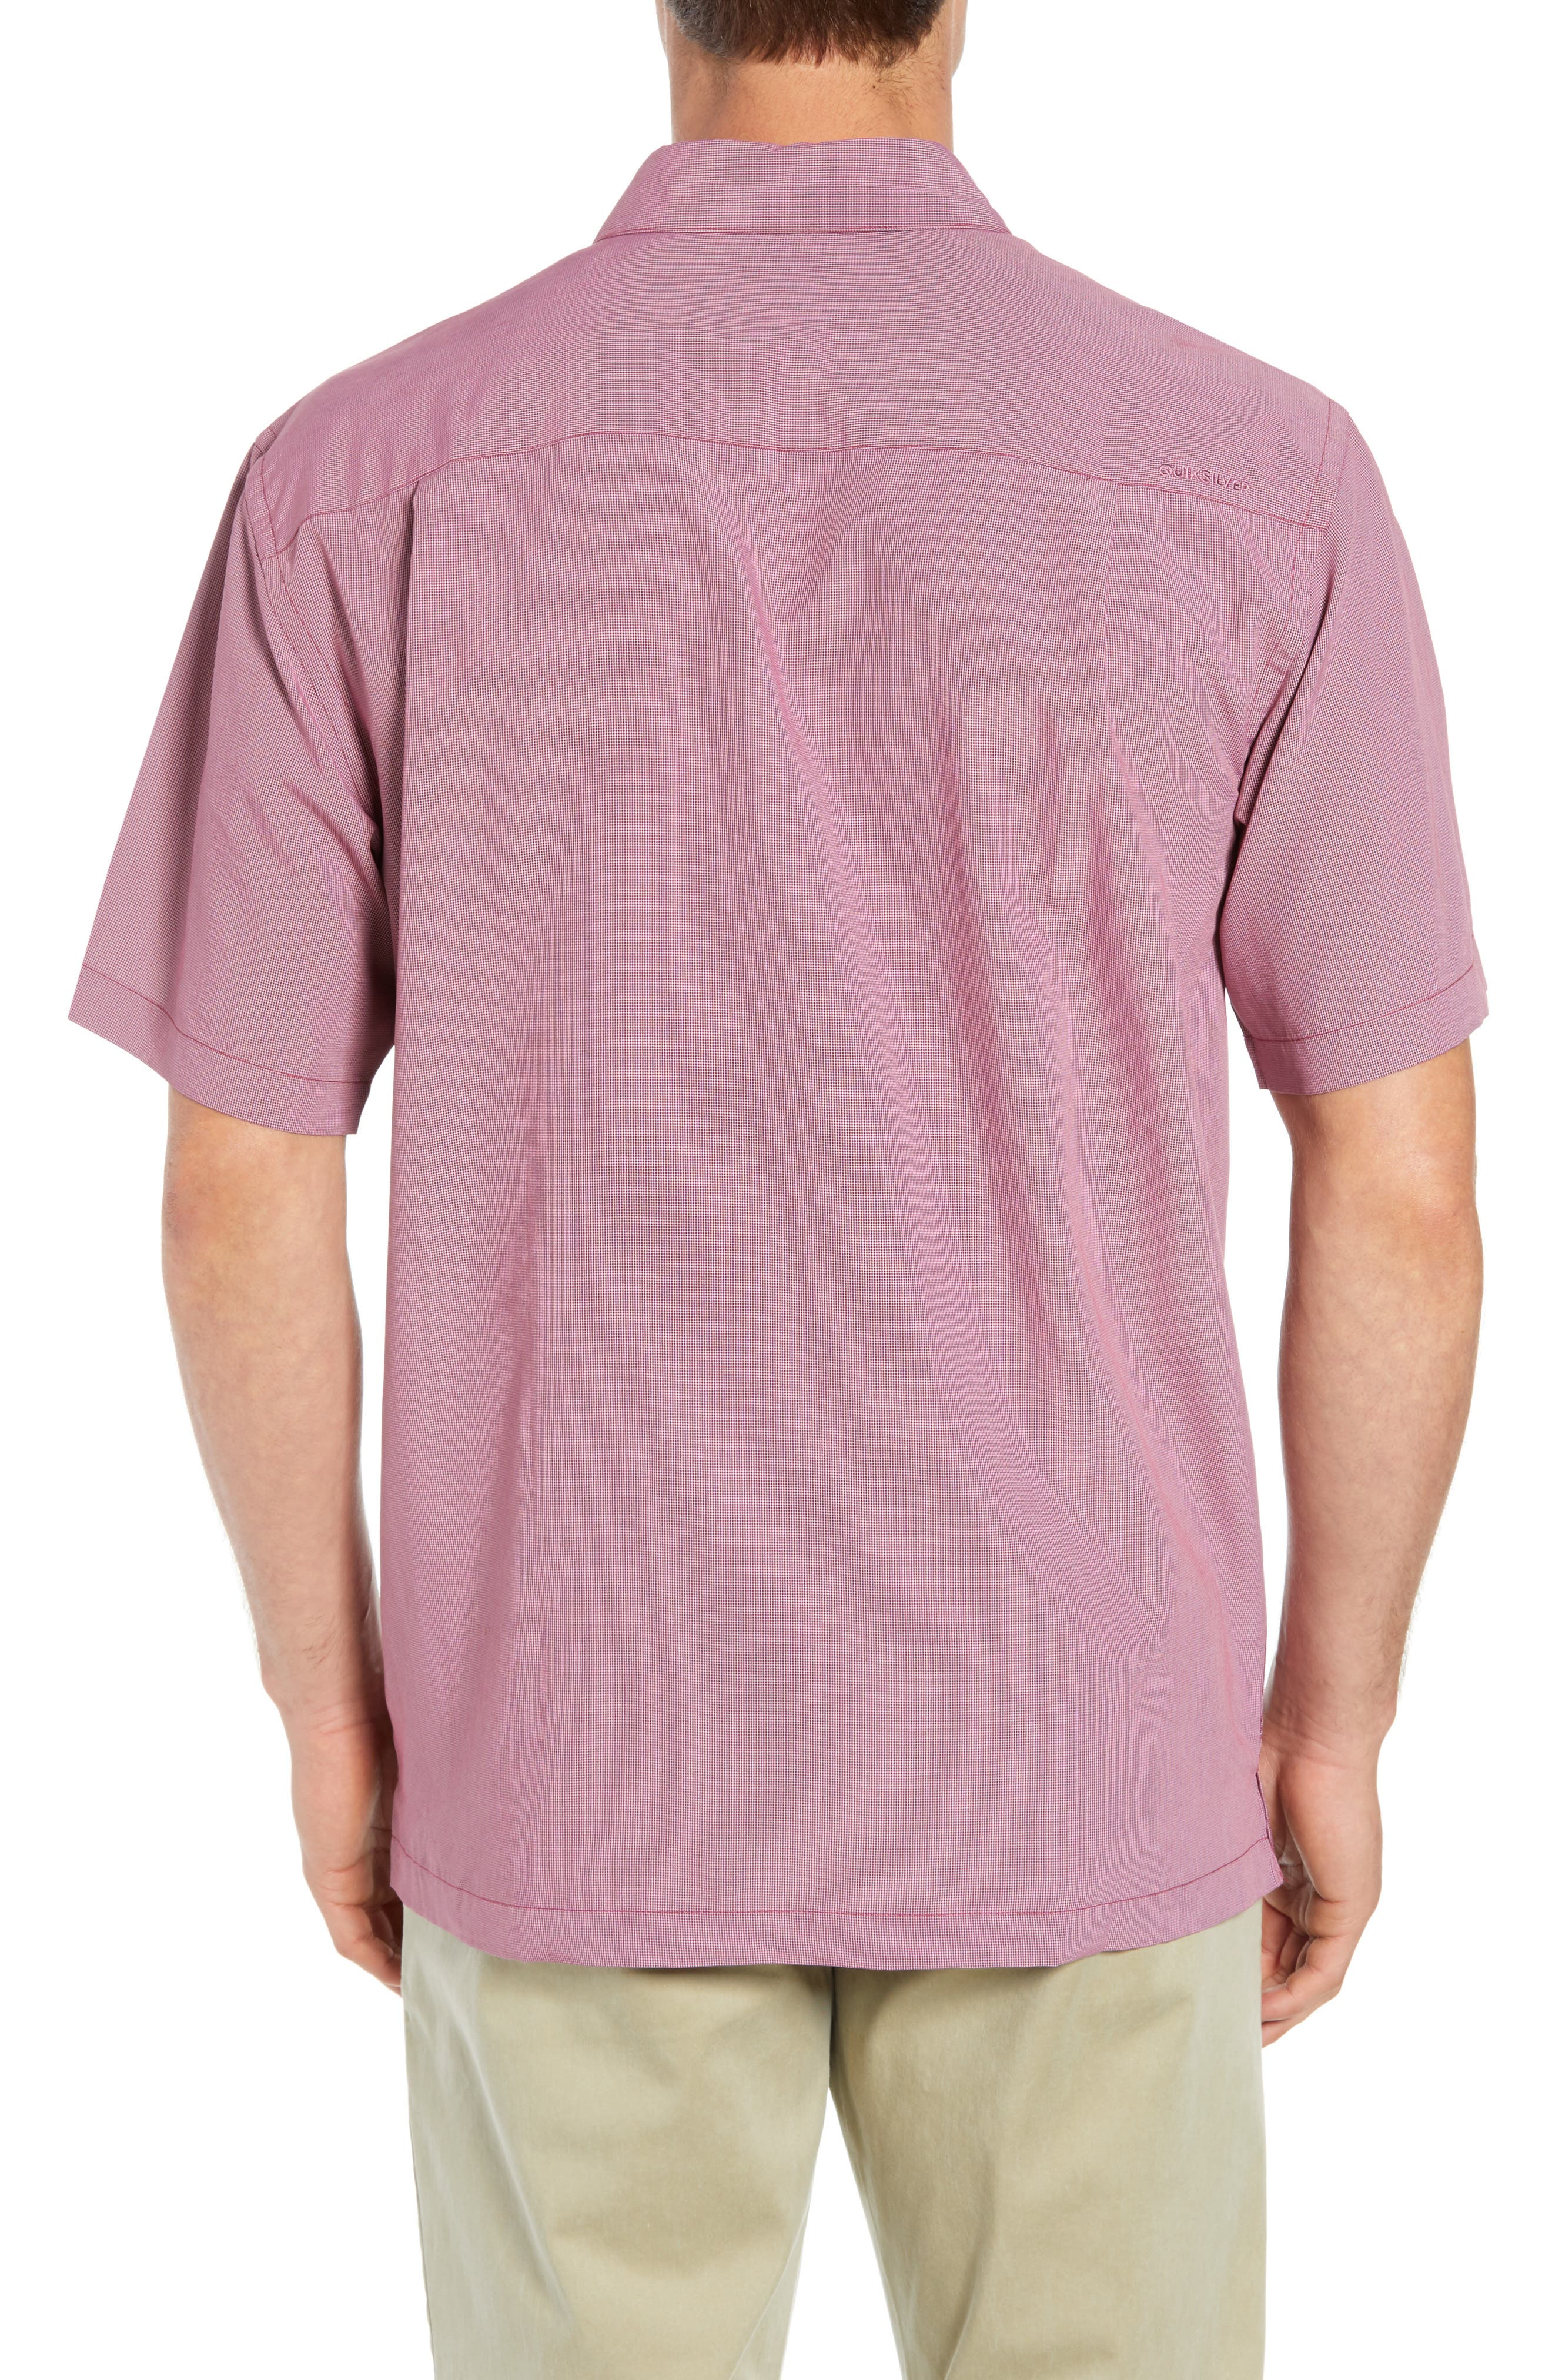 Cane Island Classic Fit Camp Shirt,                             Alternate thumbnail 3, color,                             TAWNY PORT